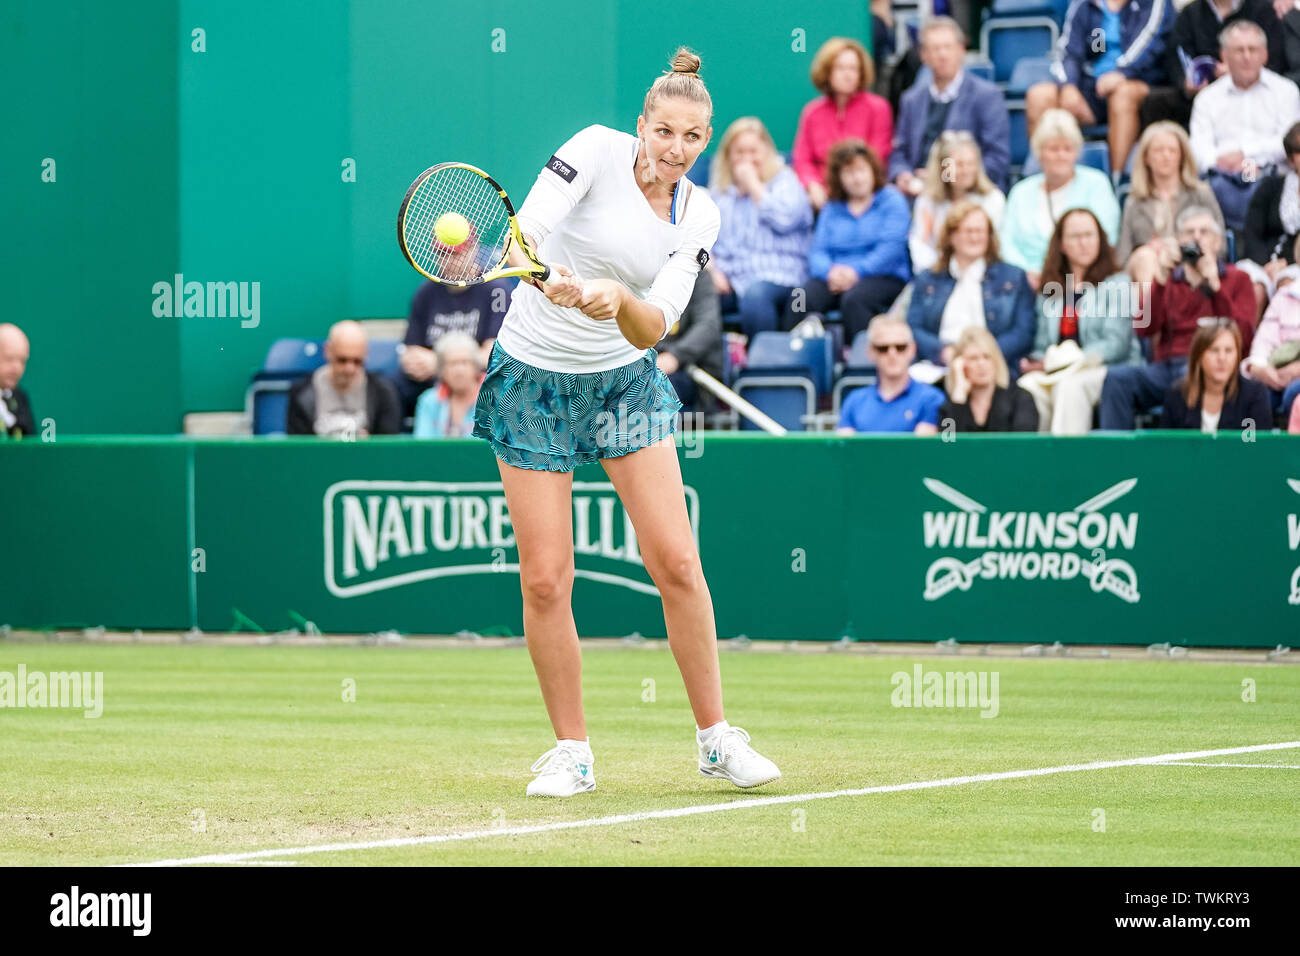 Edgbaston Priory Club, Birmingham, UK. 21st June, 2019. WTA Nature Valley Classic tennis tournament; Kristyna Pliskova (CZE) hits a strong backhand in her quarterfinal match against Barbora Strycova (CZE) Credit: Action Plus Sports/Alamy Live News Stock Photo